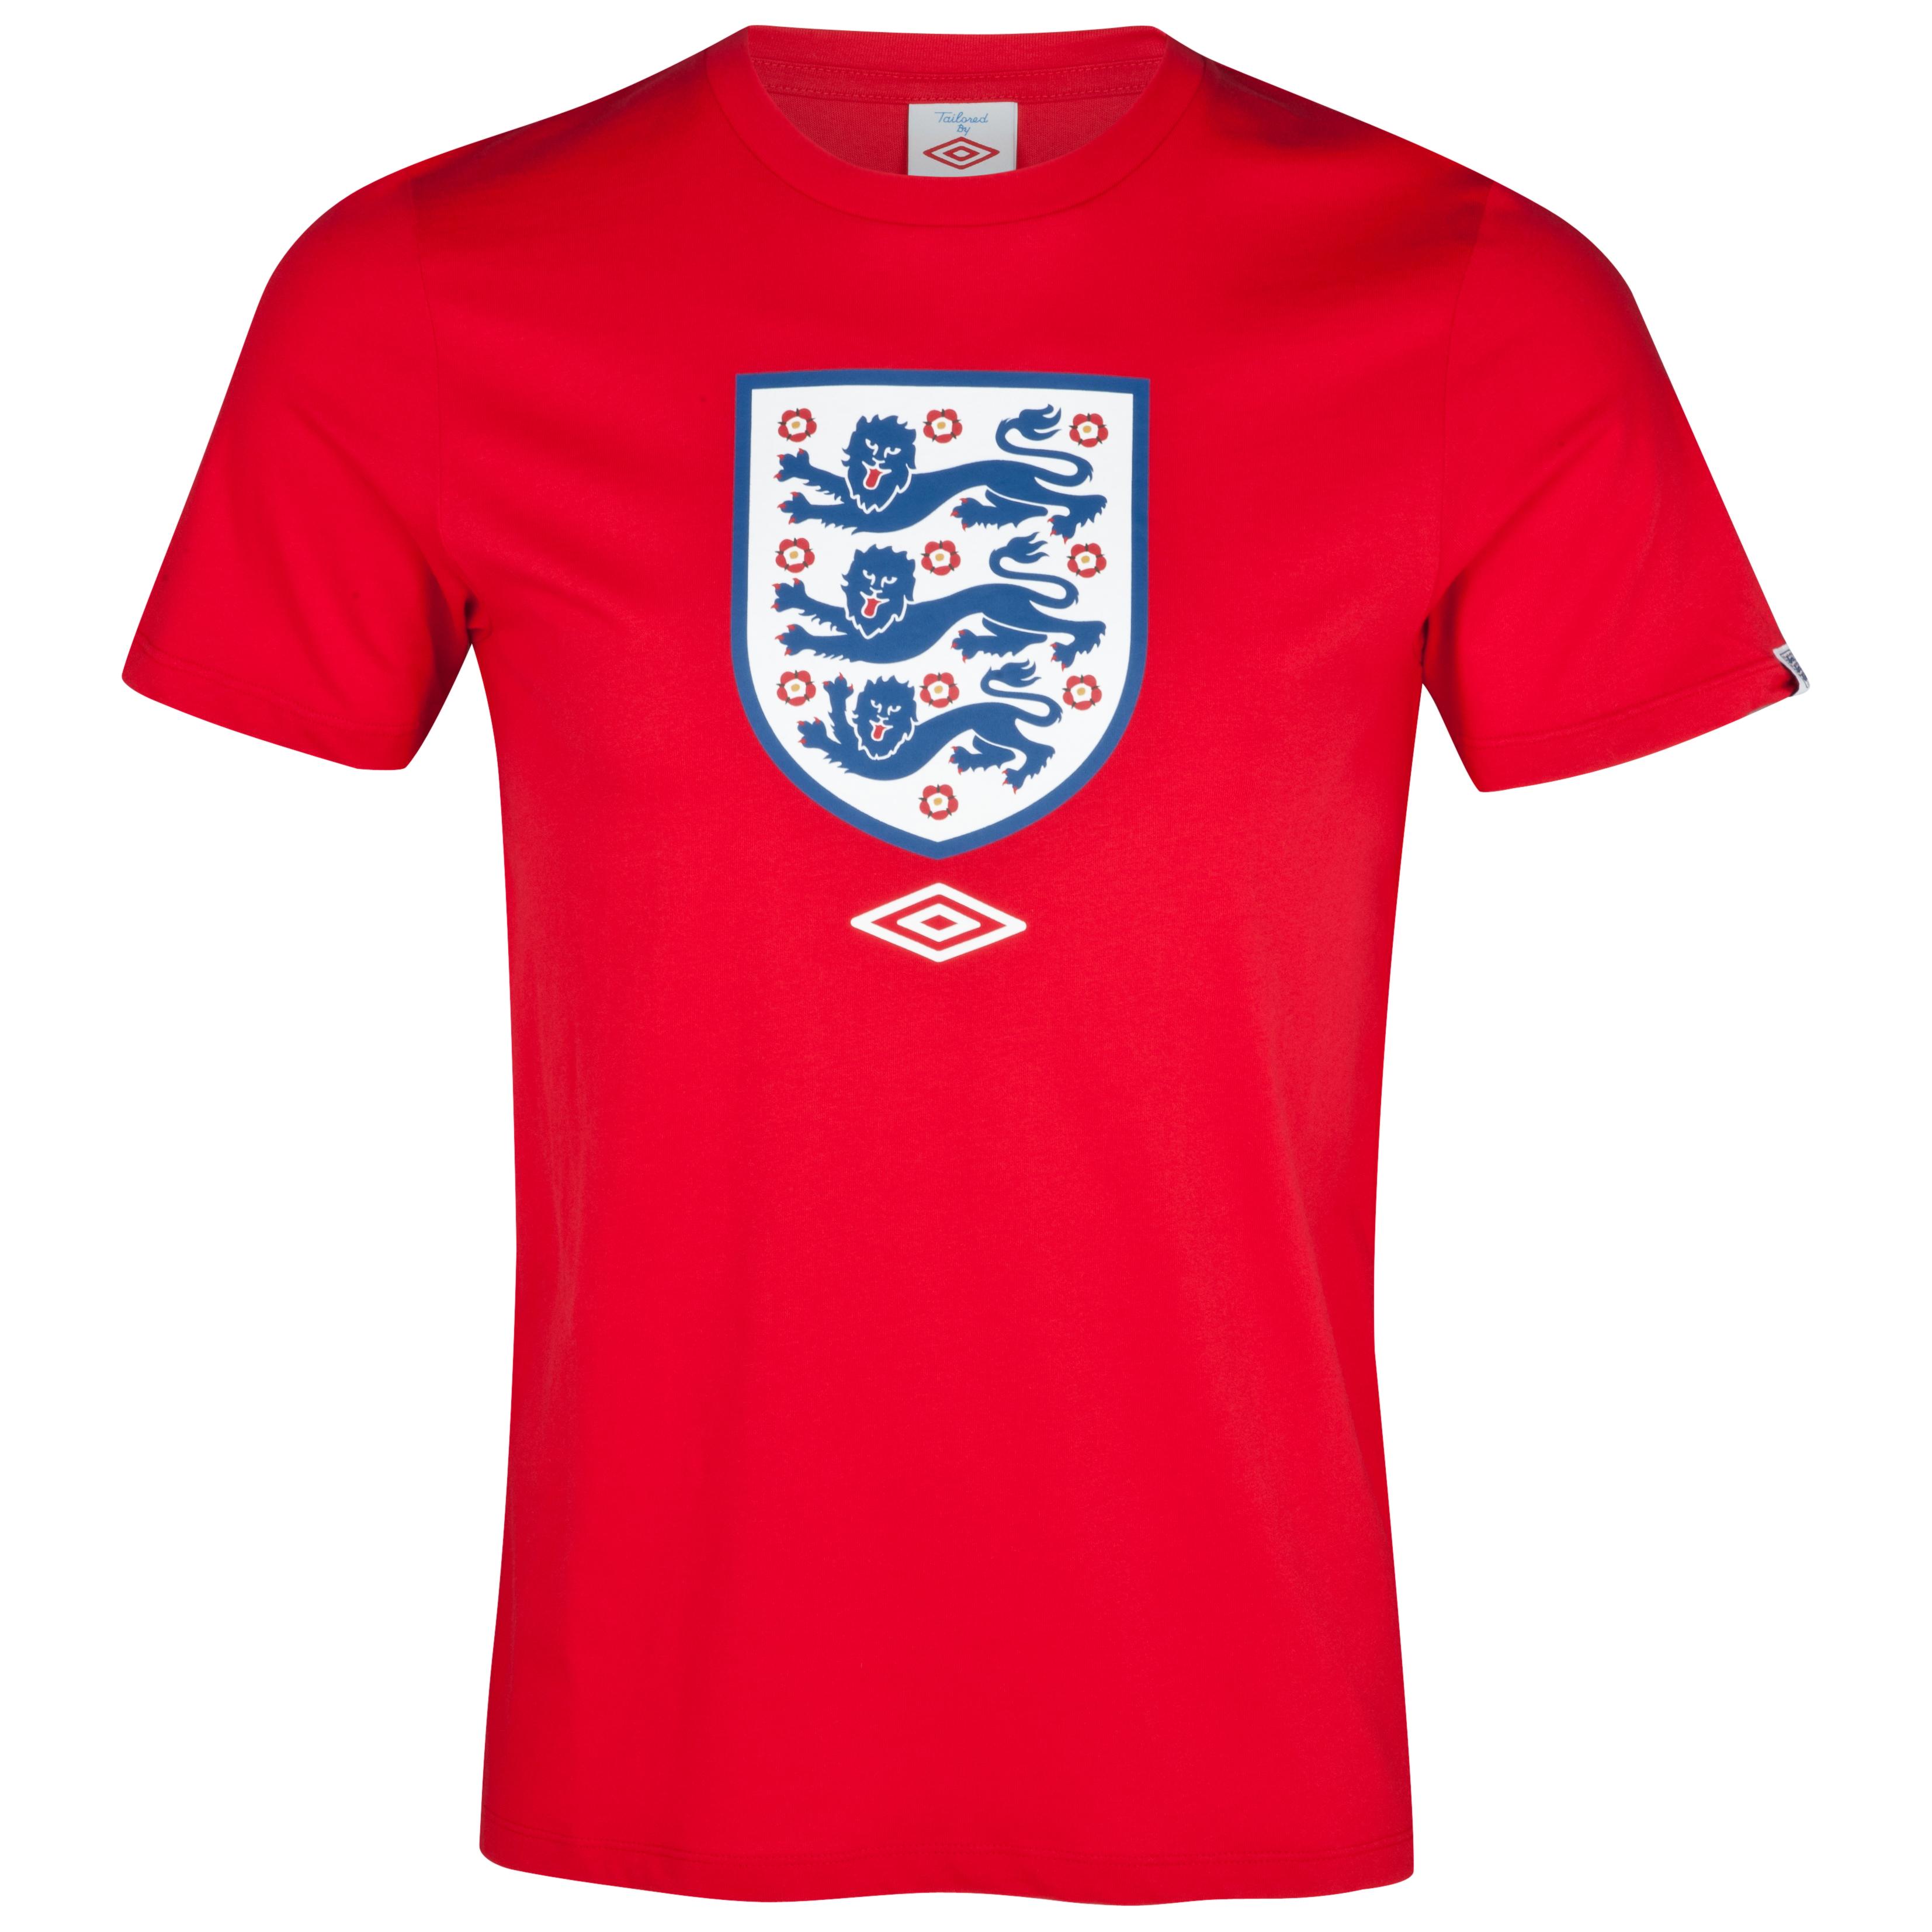 England Supporter Graphic T-Shirt - Vermillion - Boys